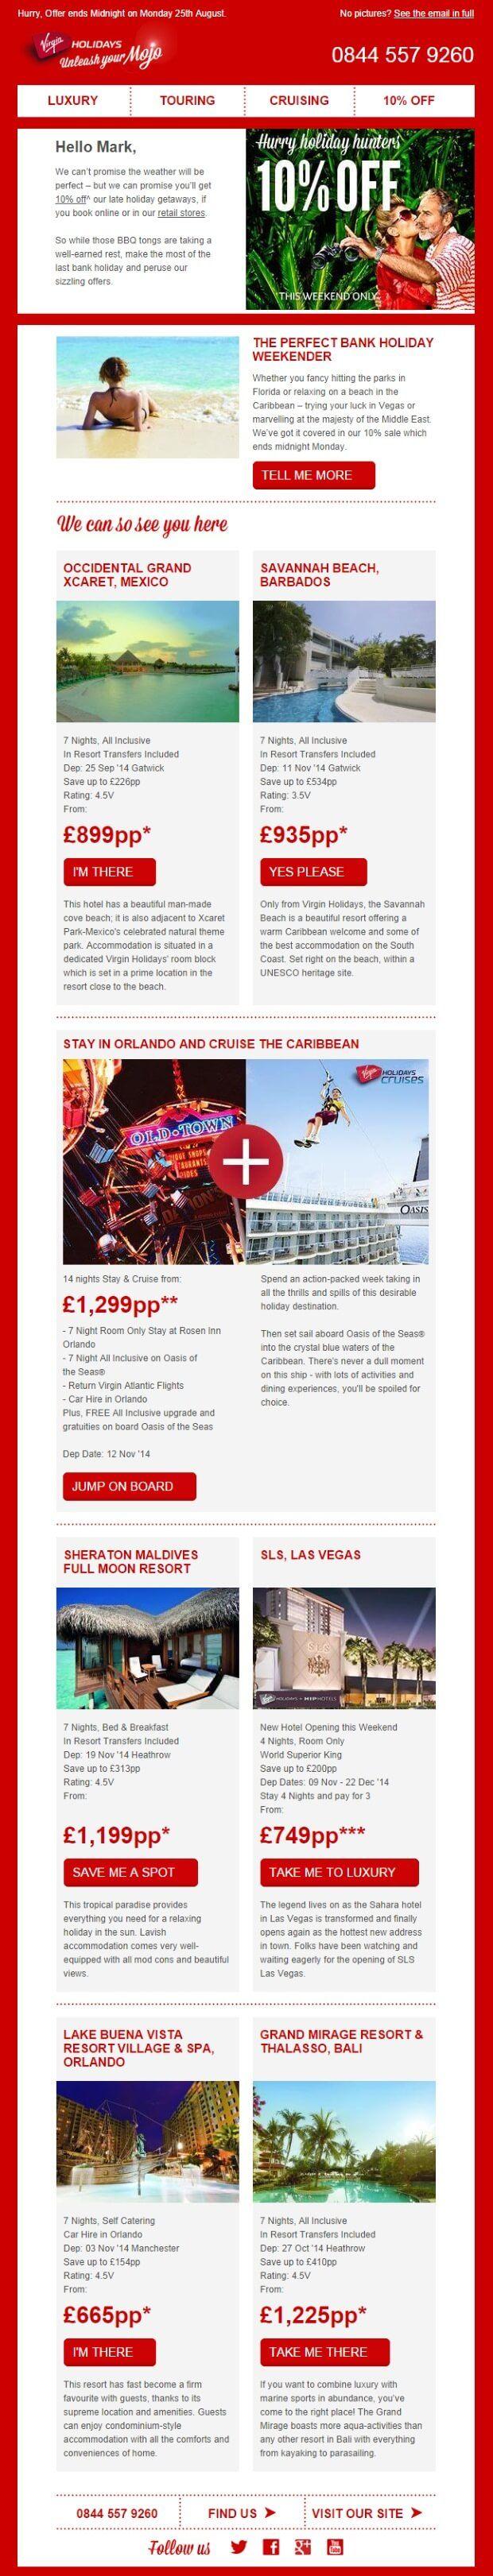 Virgin-Holidays Email Design